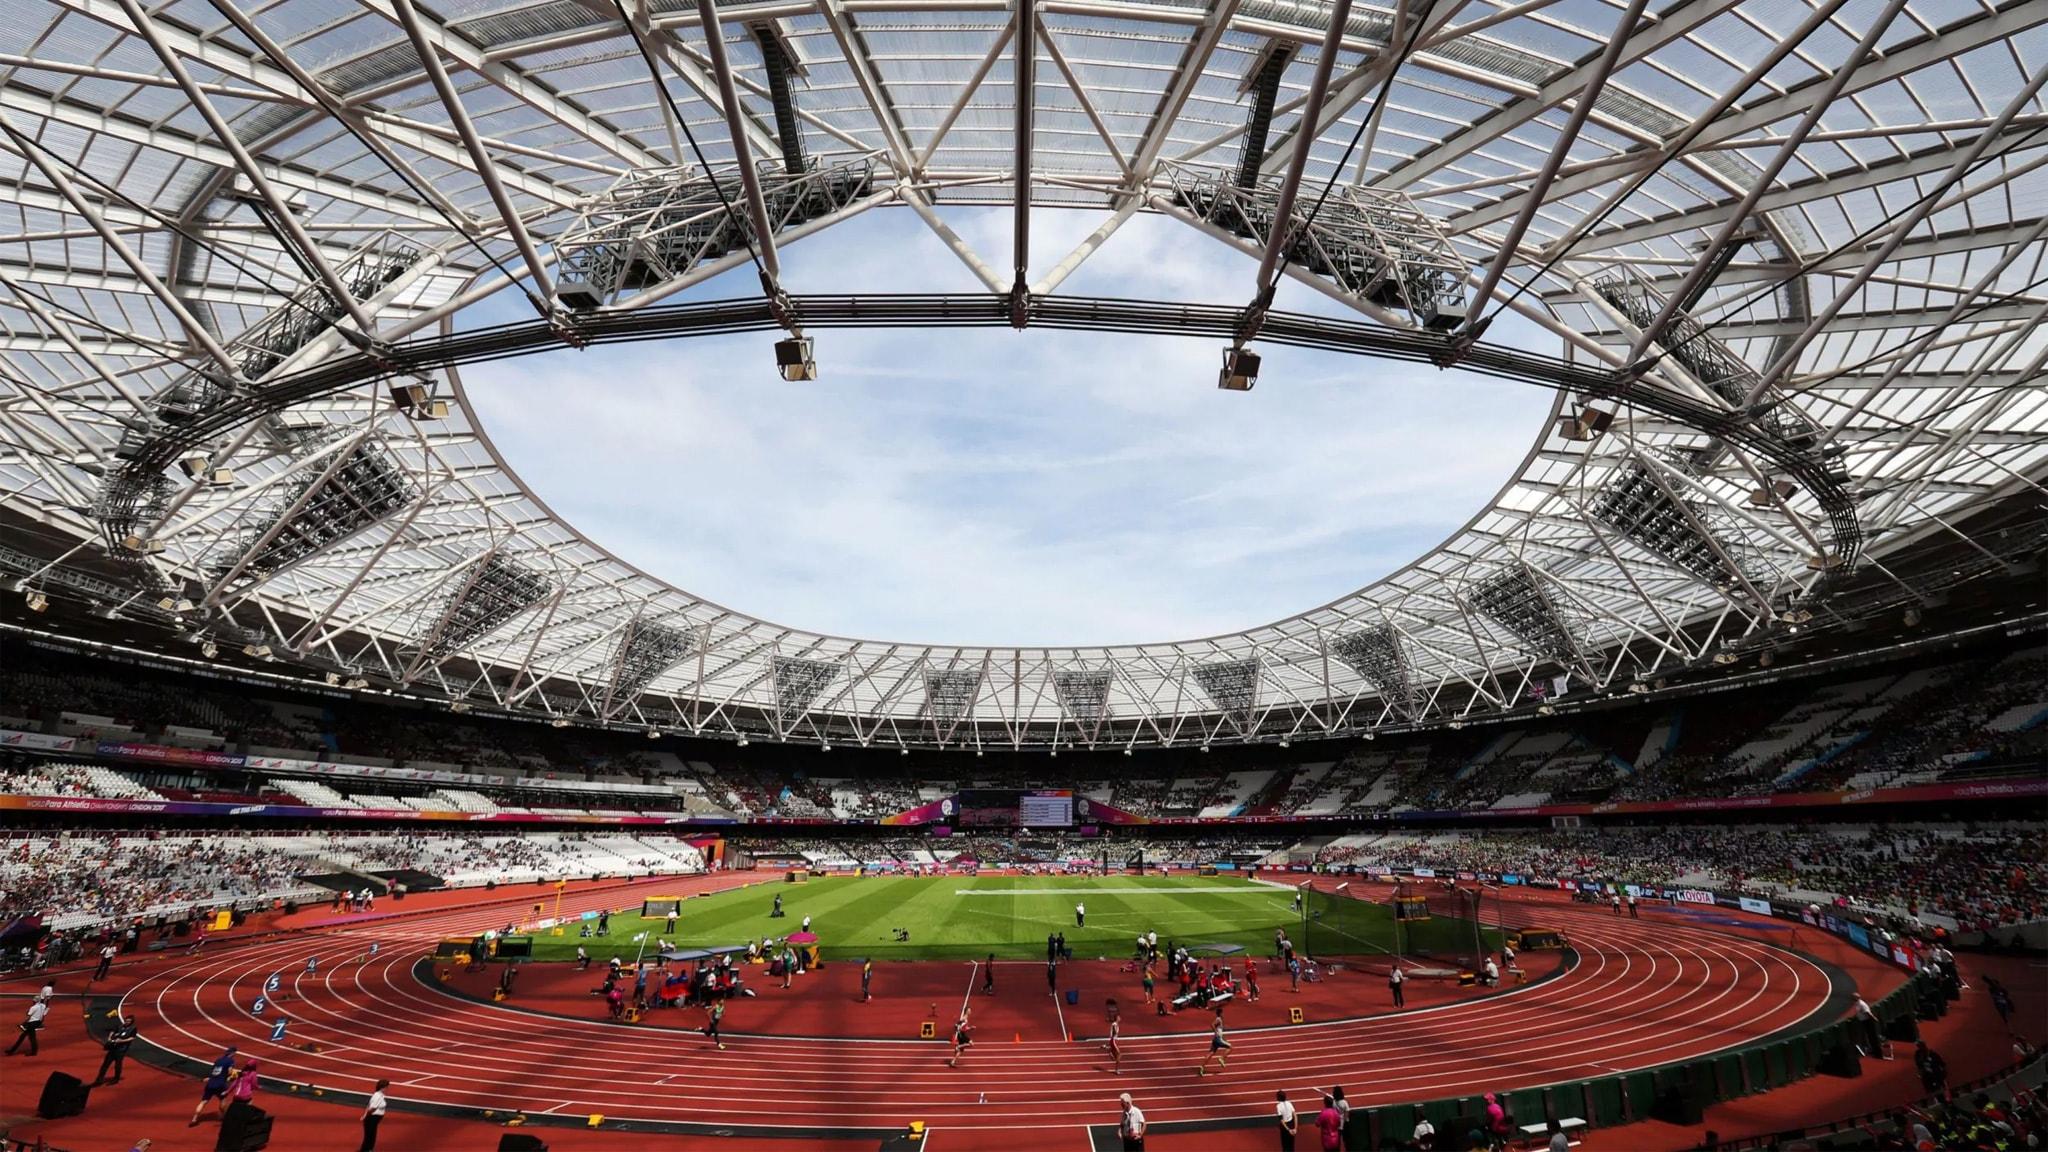 Rai Sport Magazine - Sport Paralimpici: Campionati Mondiali di Atletica Leggera (Dubai/UEA) 3a giornata